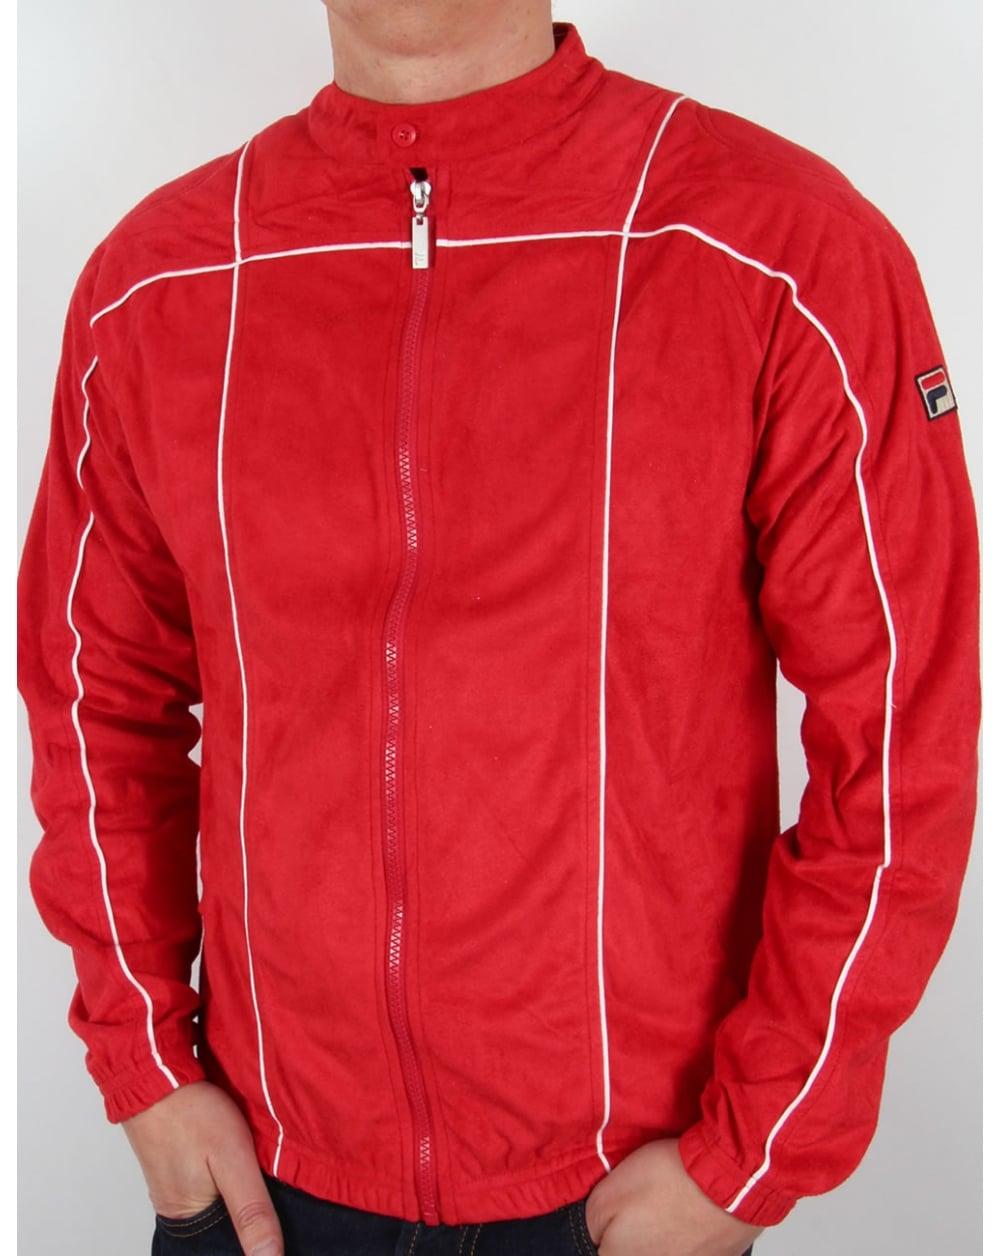 e76998029017 Fila Vintage Fila Vintage Terrinda Mk3 Track Top Red